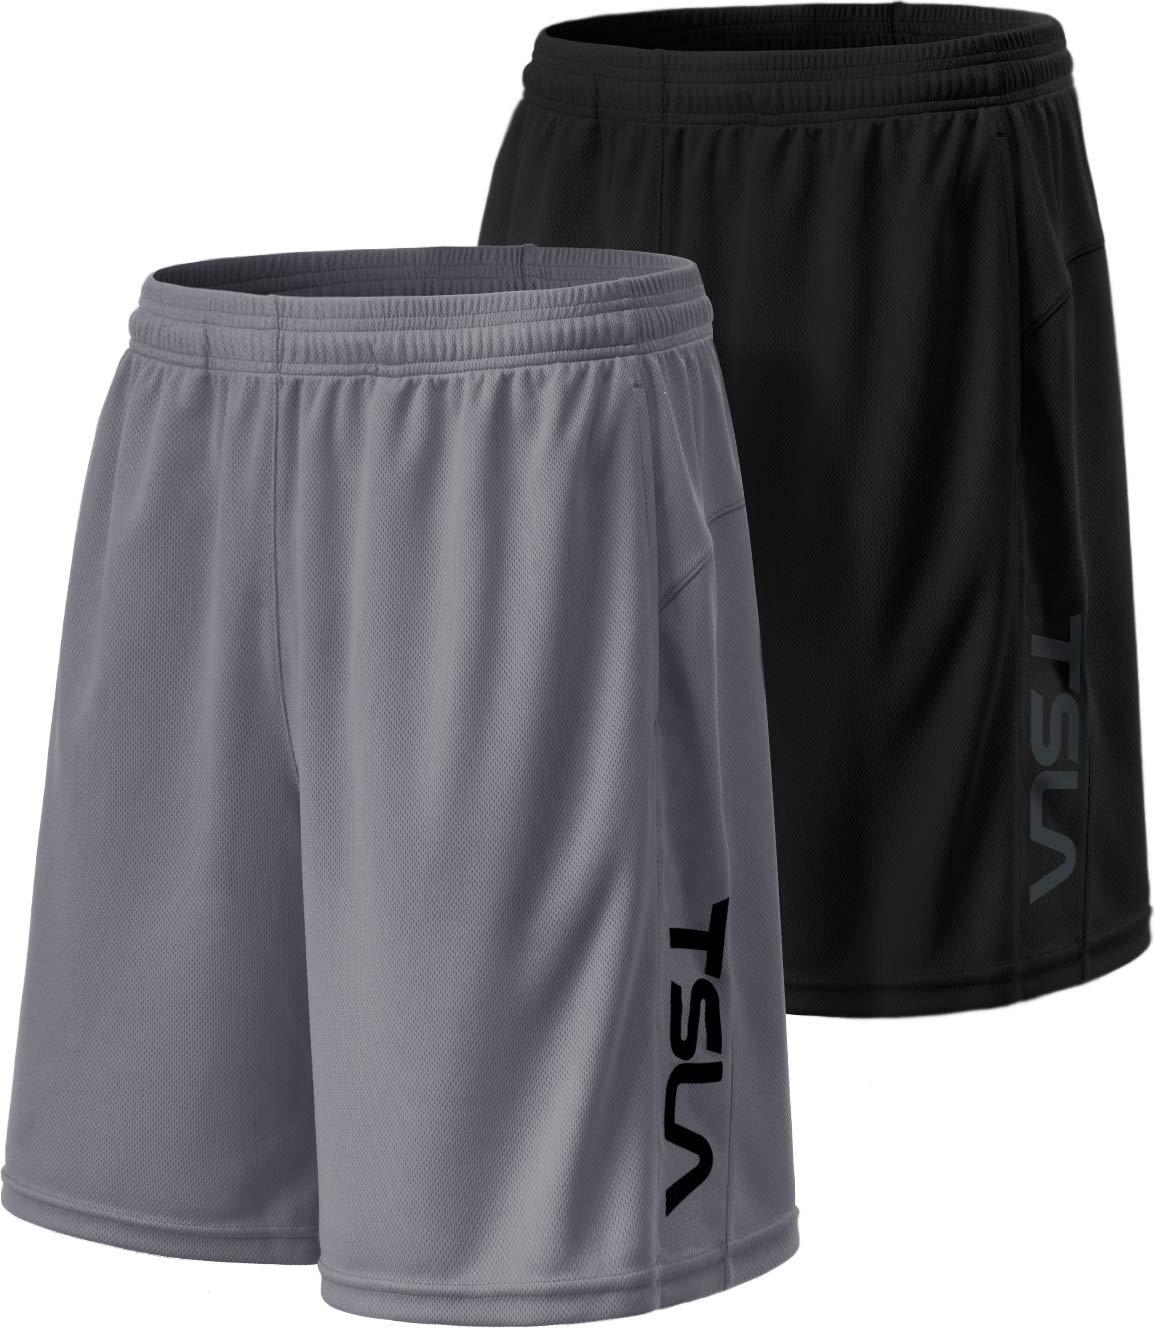 TSLA Men's HyperDri Cool Quick-Dry Active Lightweight Workout Performance Shorts (Pack of 2), Hyper Dri Dual Pack(mbh22) - Black/Grey, Small